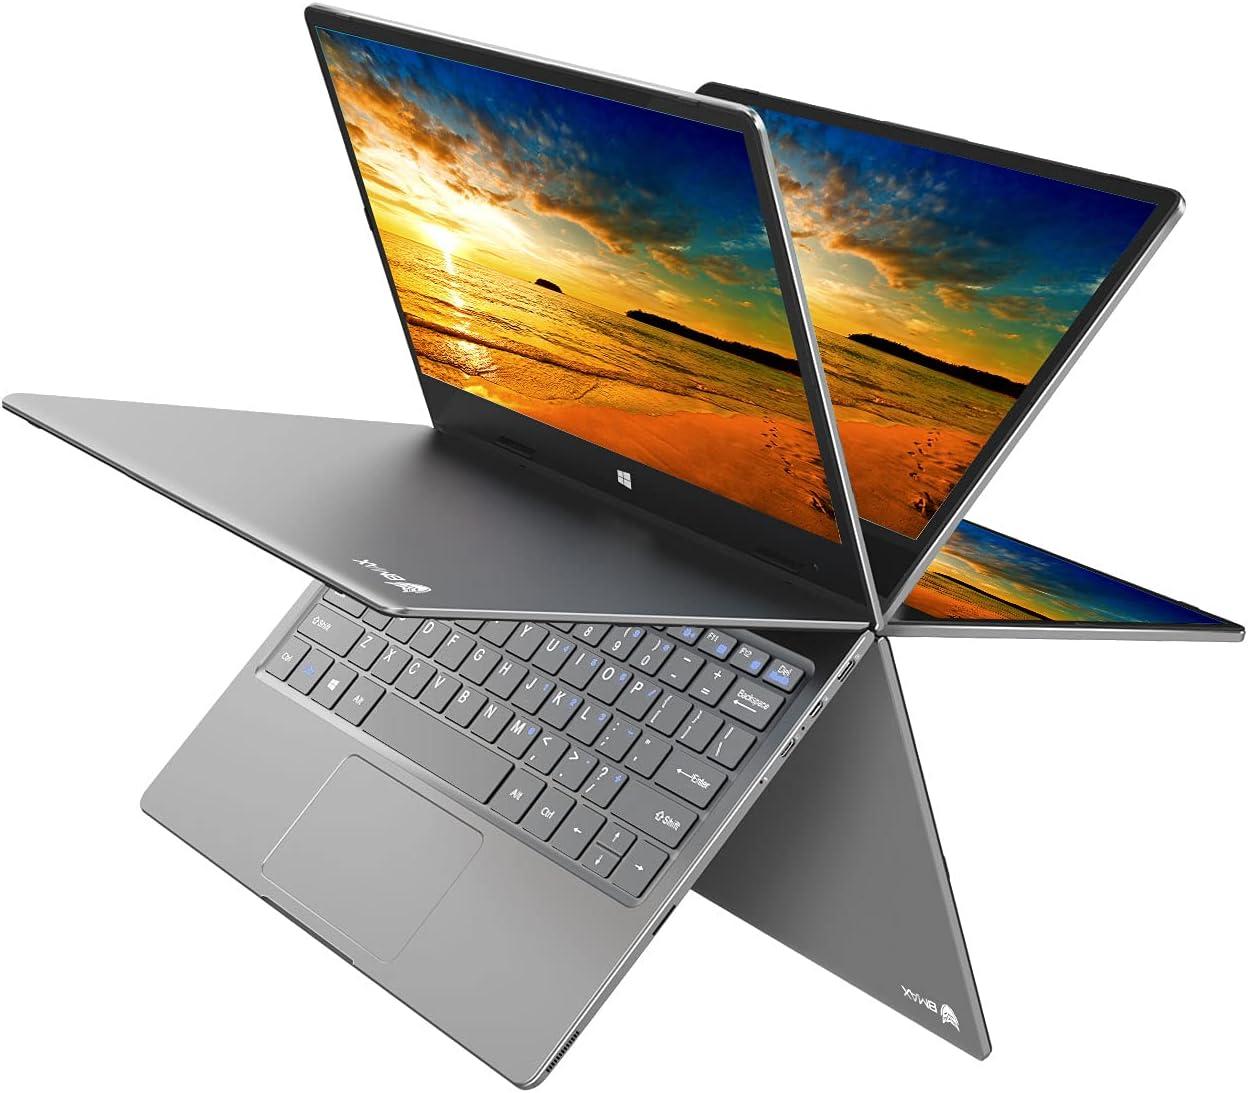 BMAX Y11 2 in 1 Laptop, Touchscreen 11.6